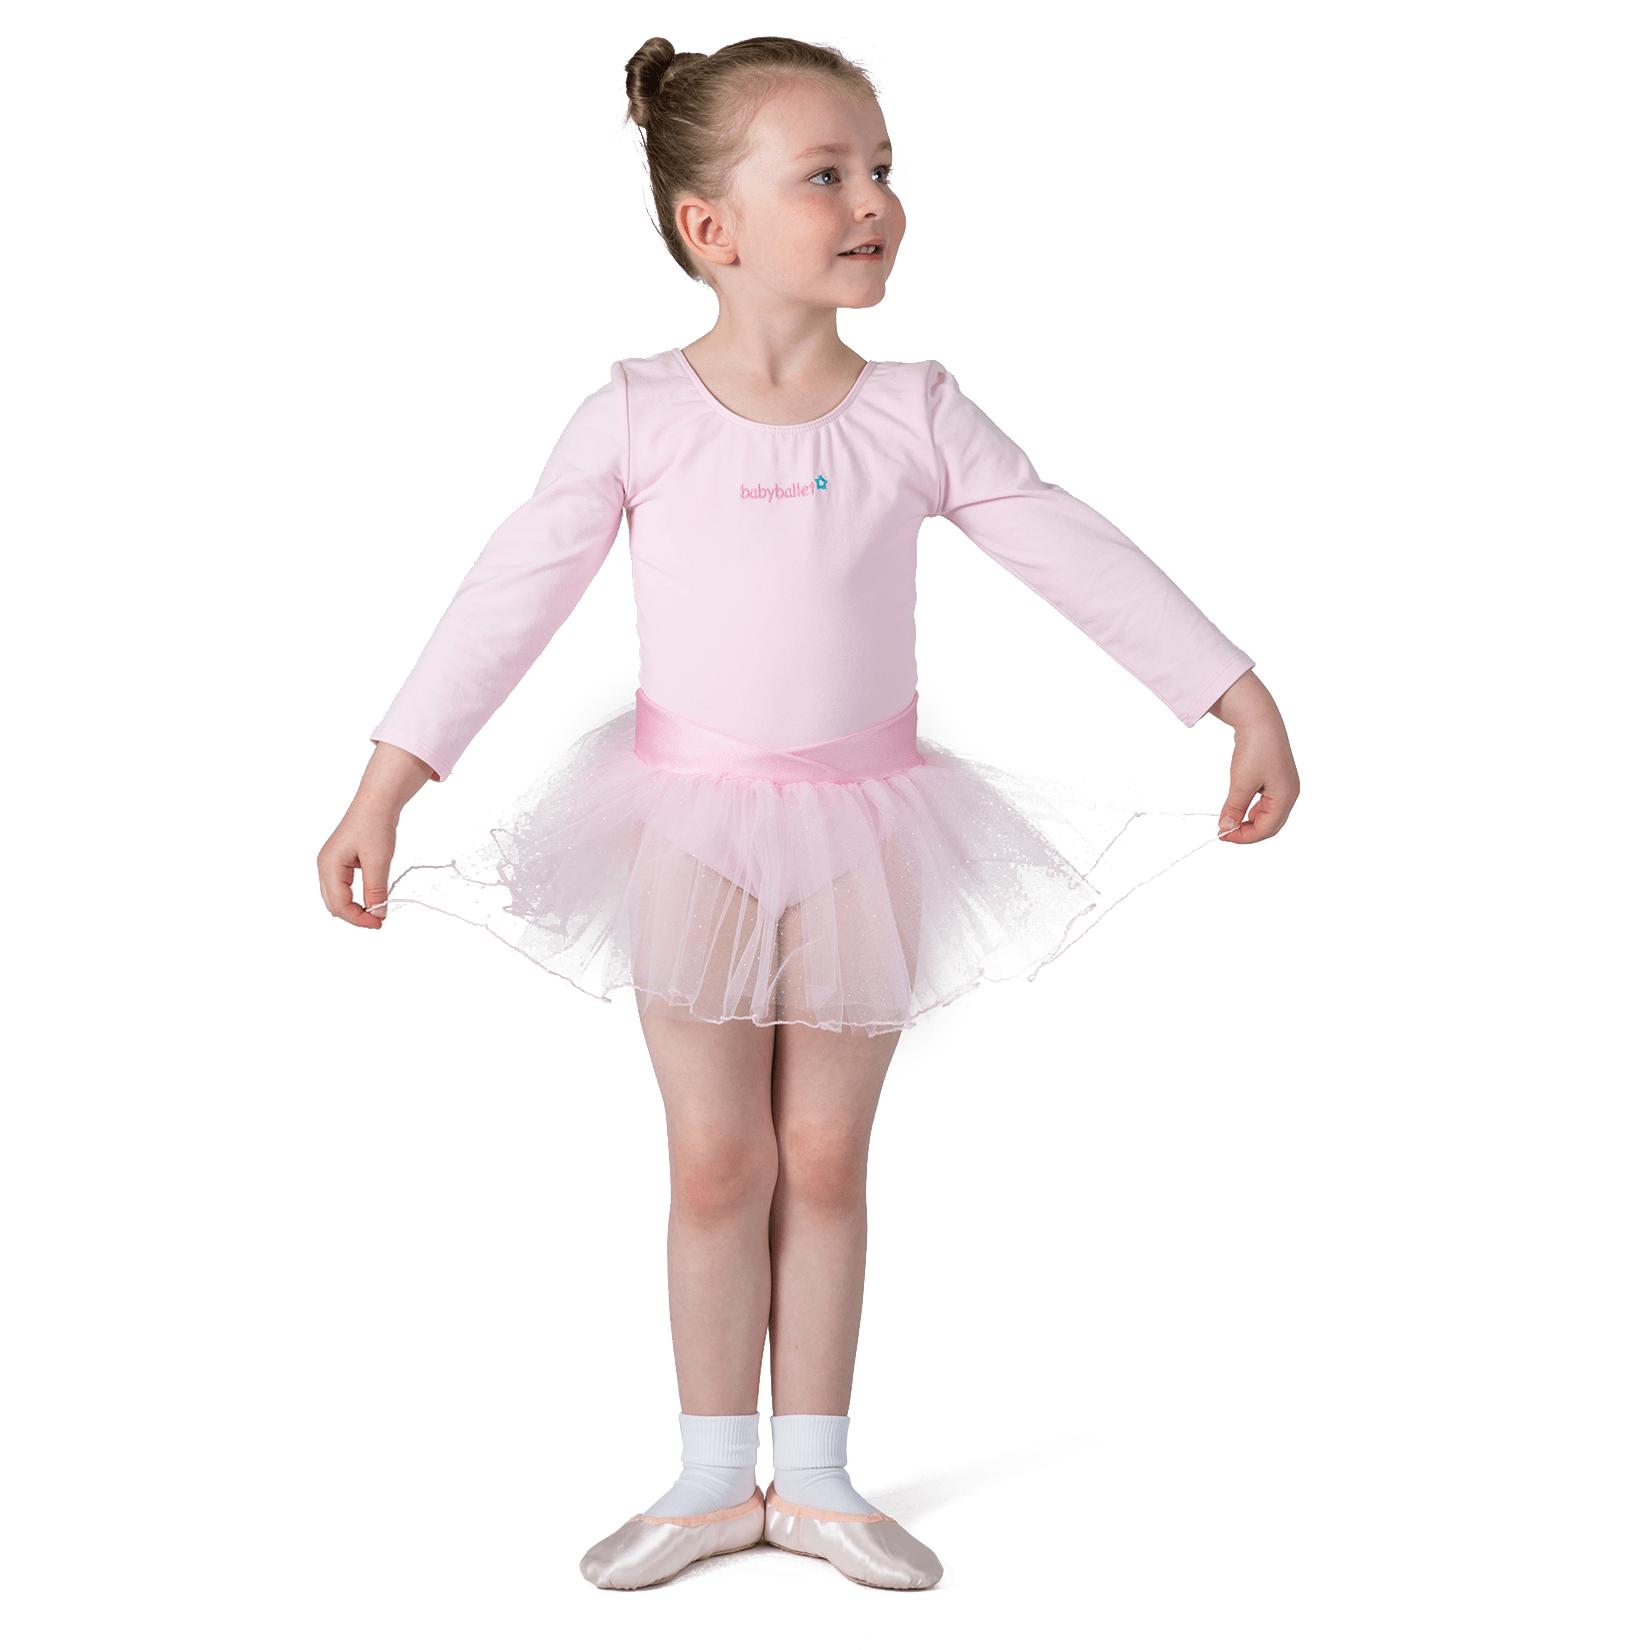 Child Ballet Shoes Uk